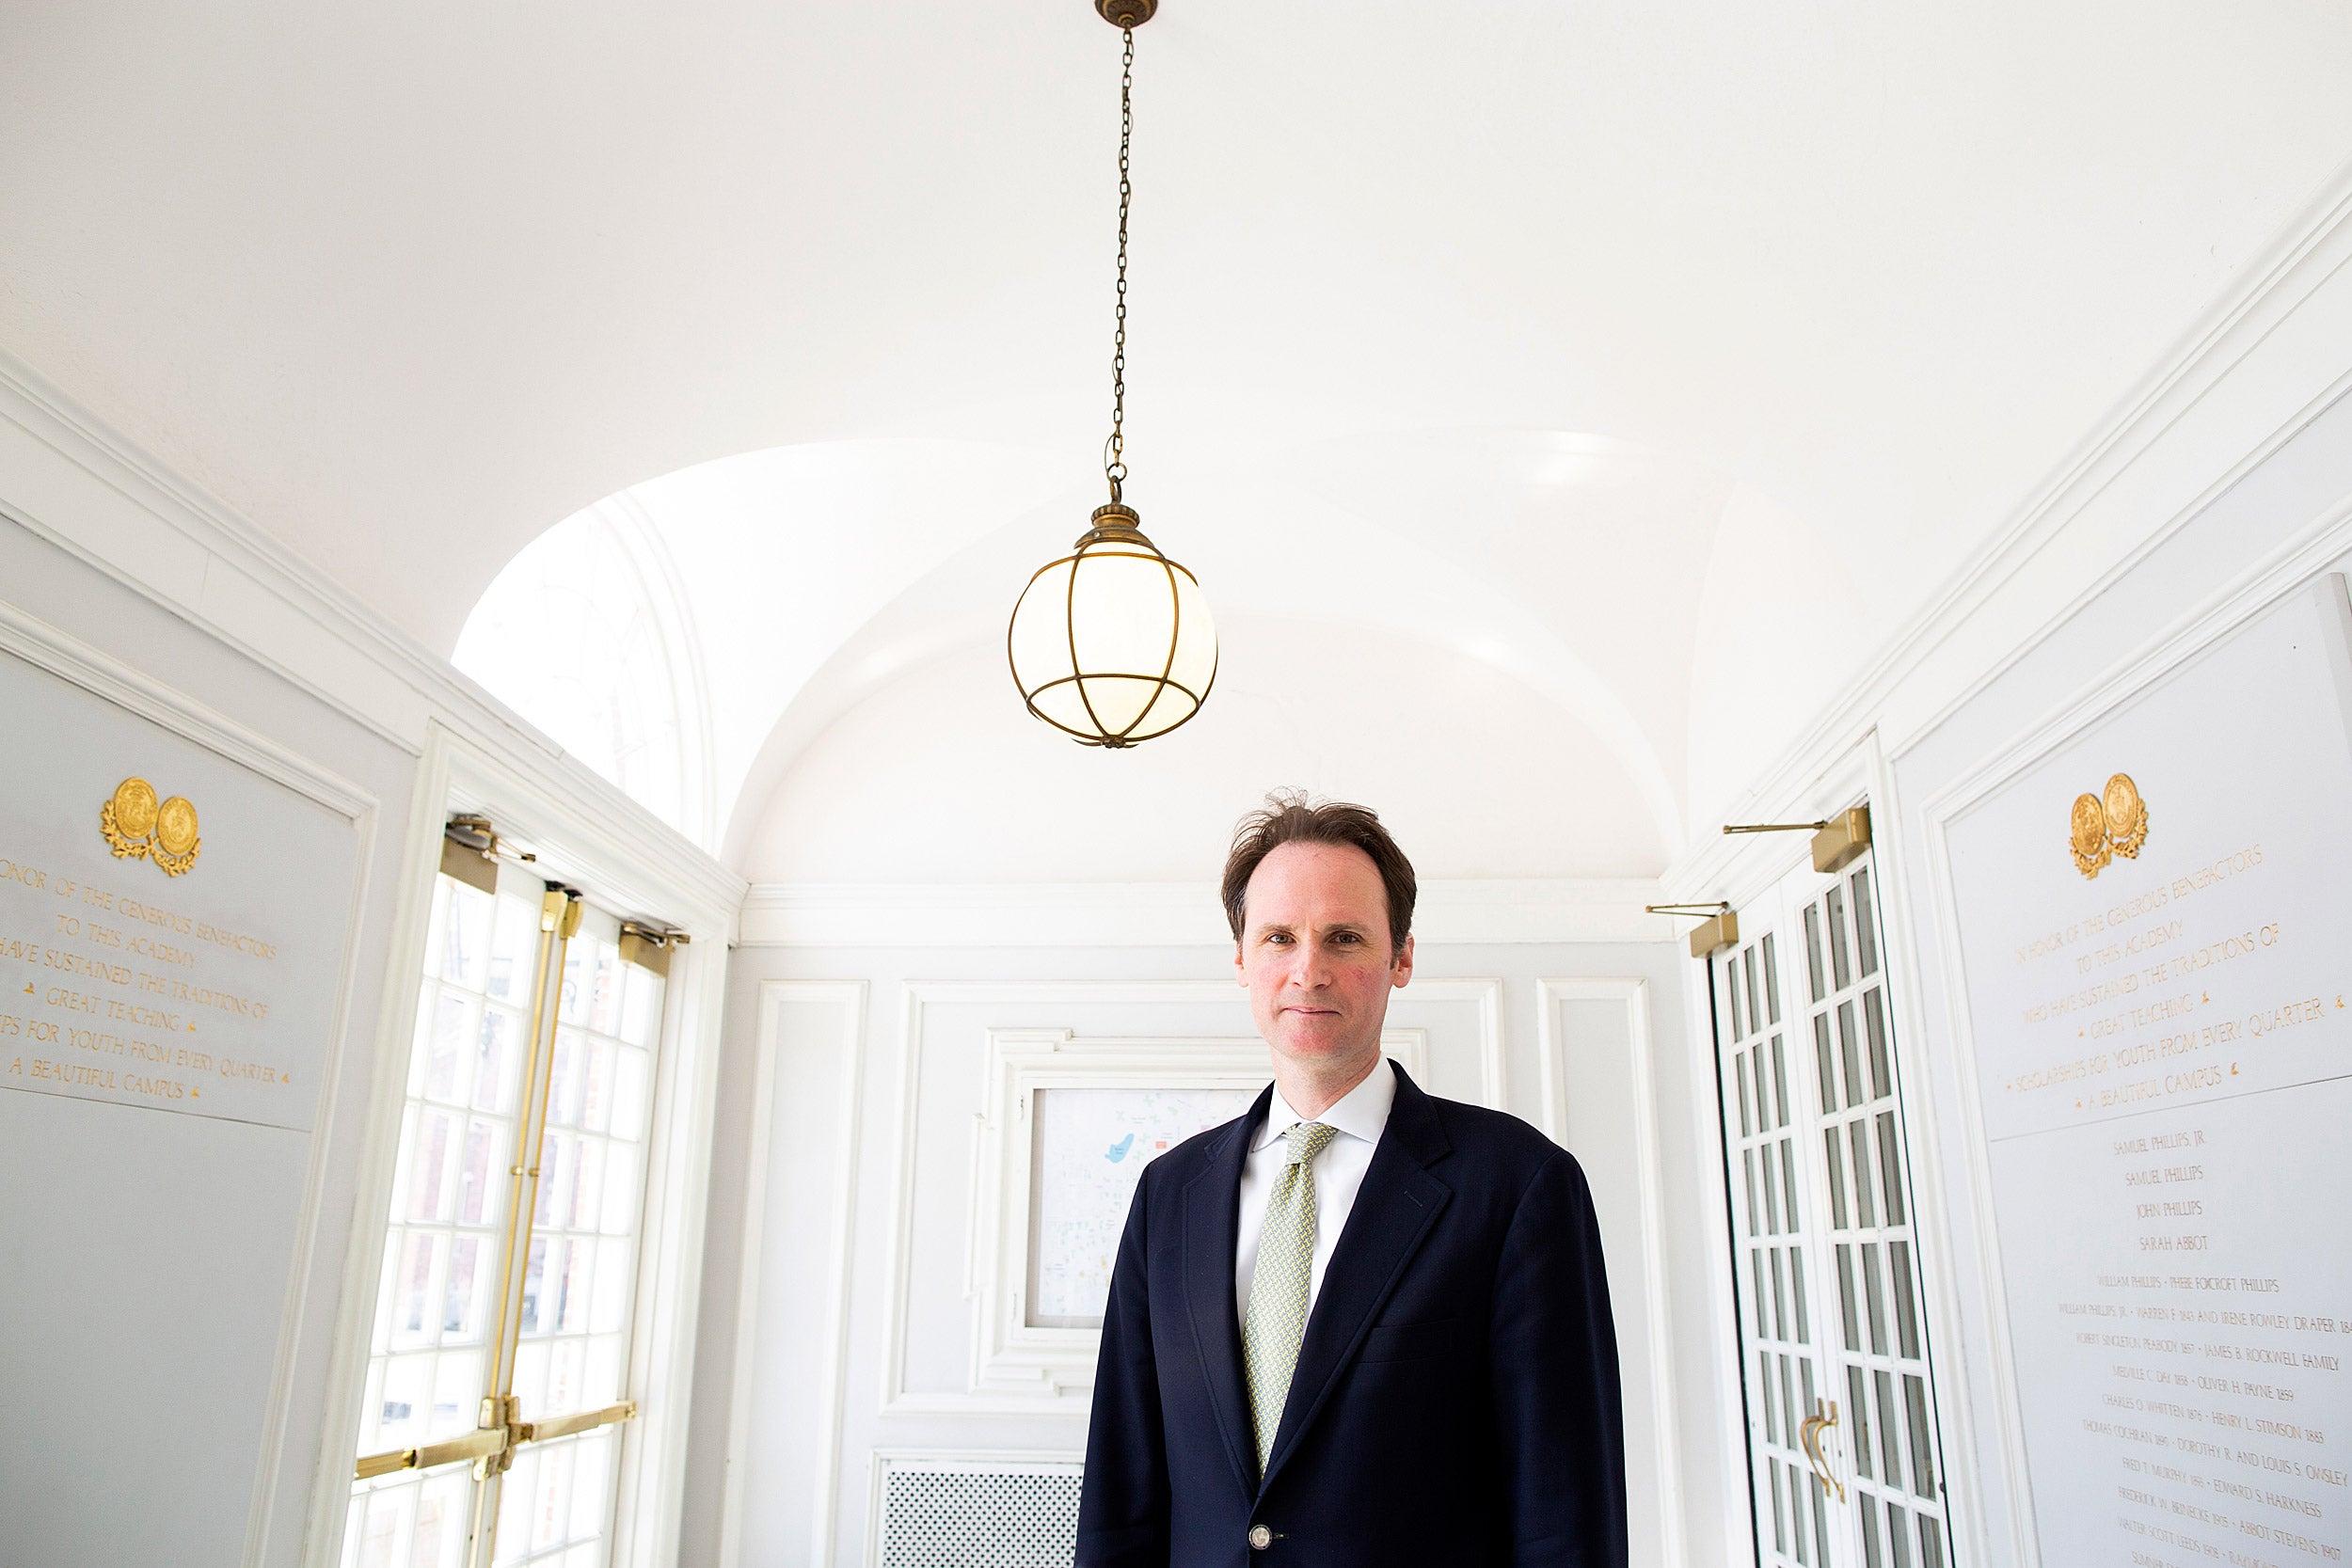 Former Harvard Law School professor John Palfrey is the new head of the MacArthur Foundation.